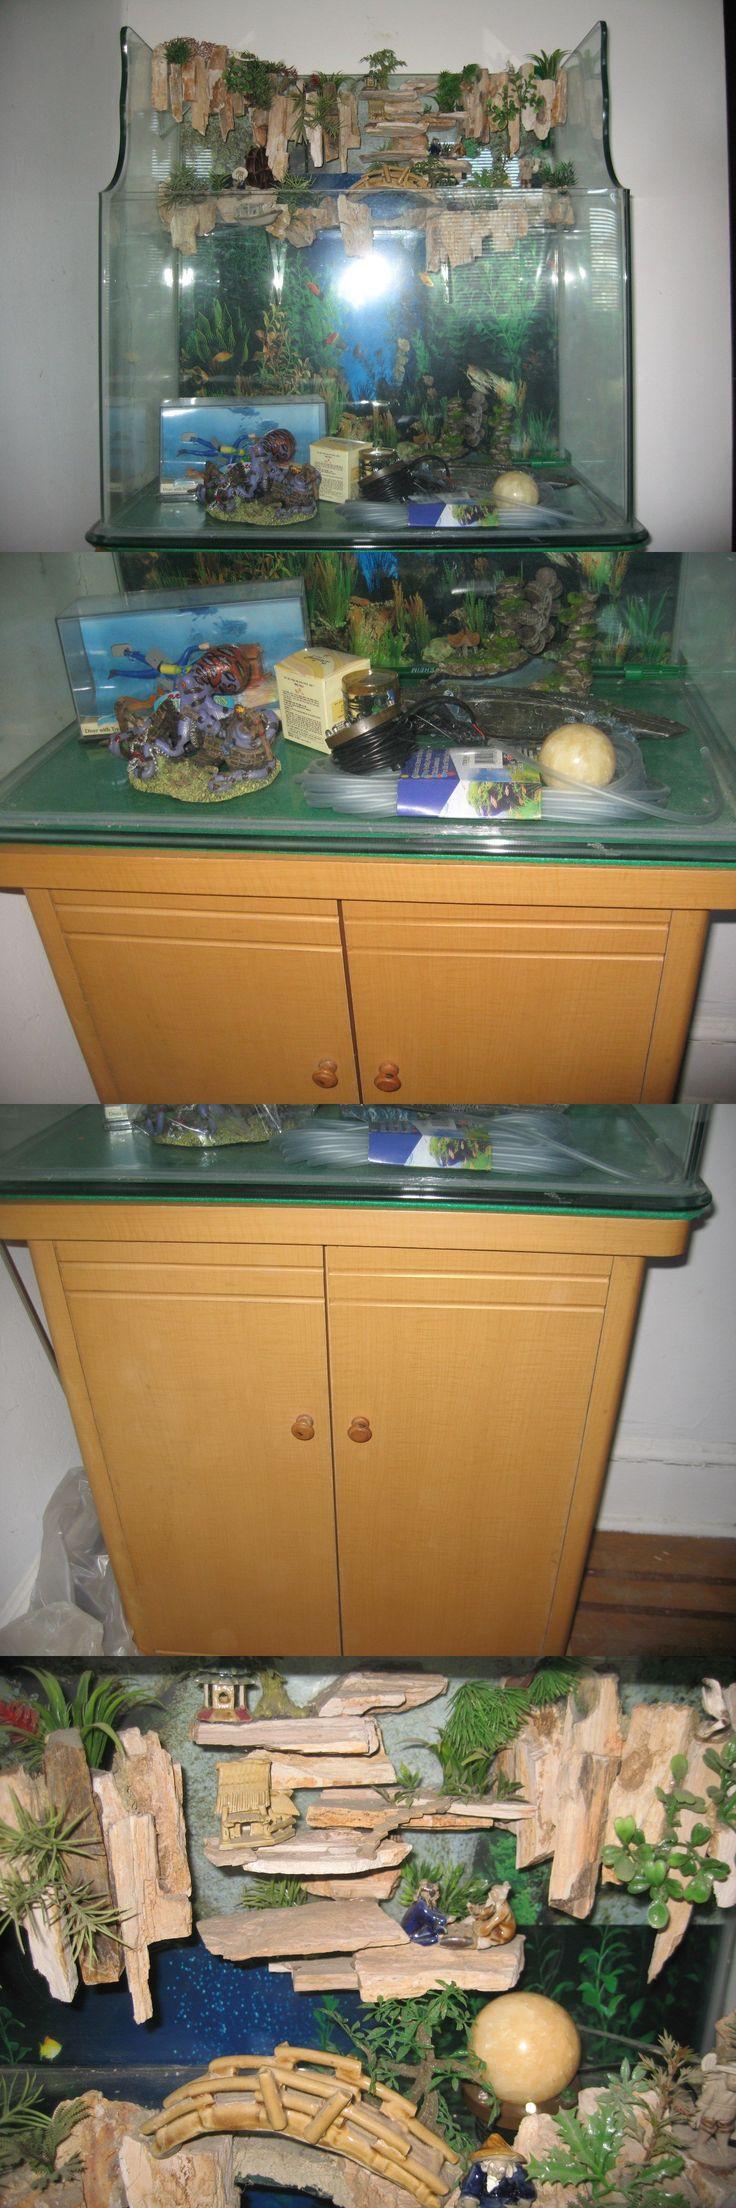 Fish tank for feng shui - Aquariums And Tanks 20755 Chinese Feng Shui Aquarium Aqua Vim Custom Bent Glass Seamless Glass